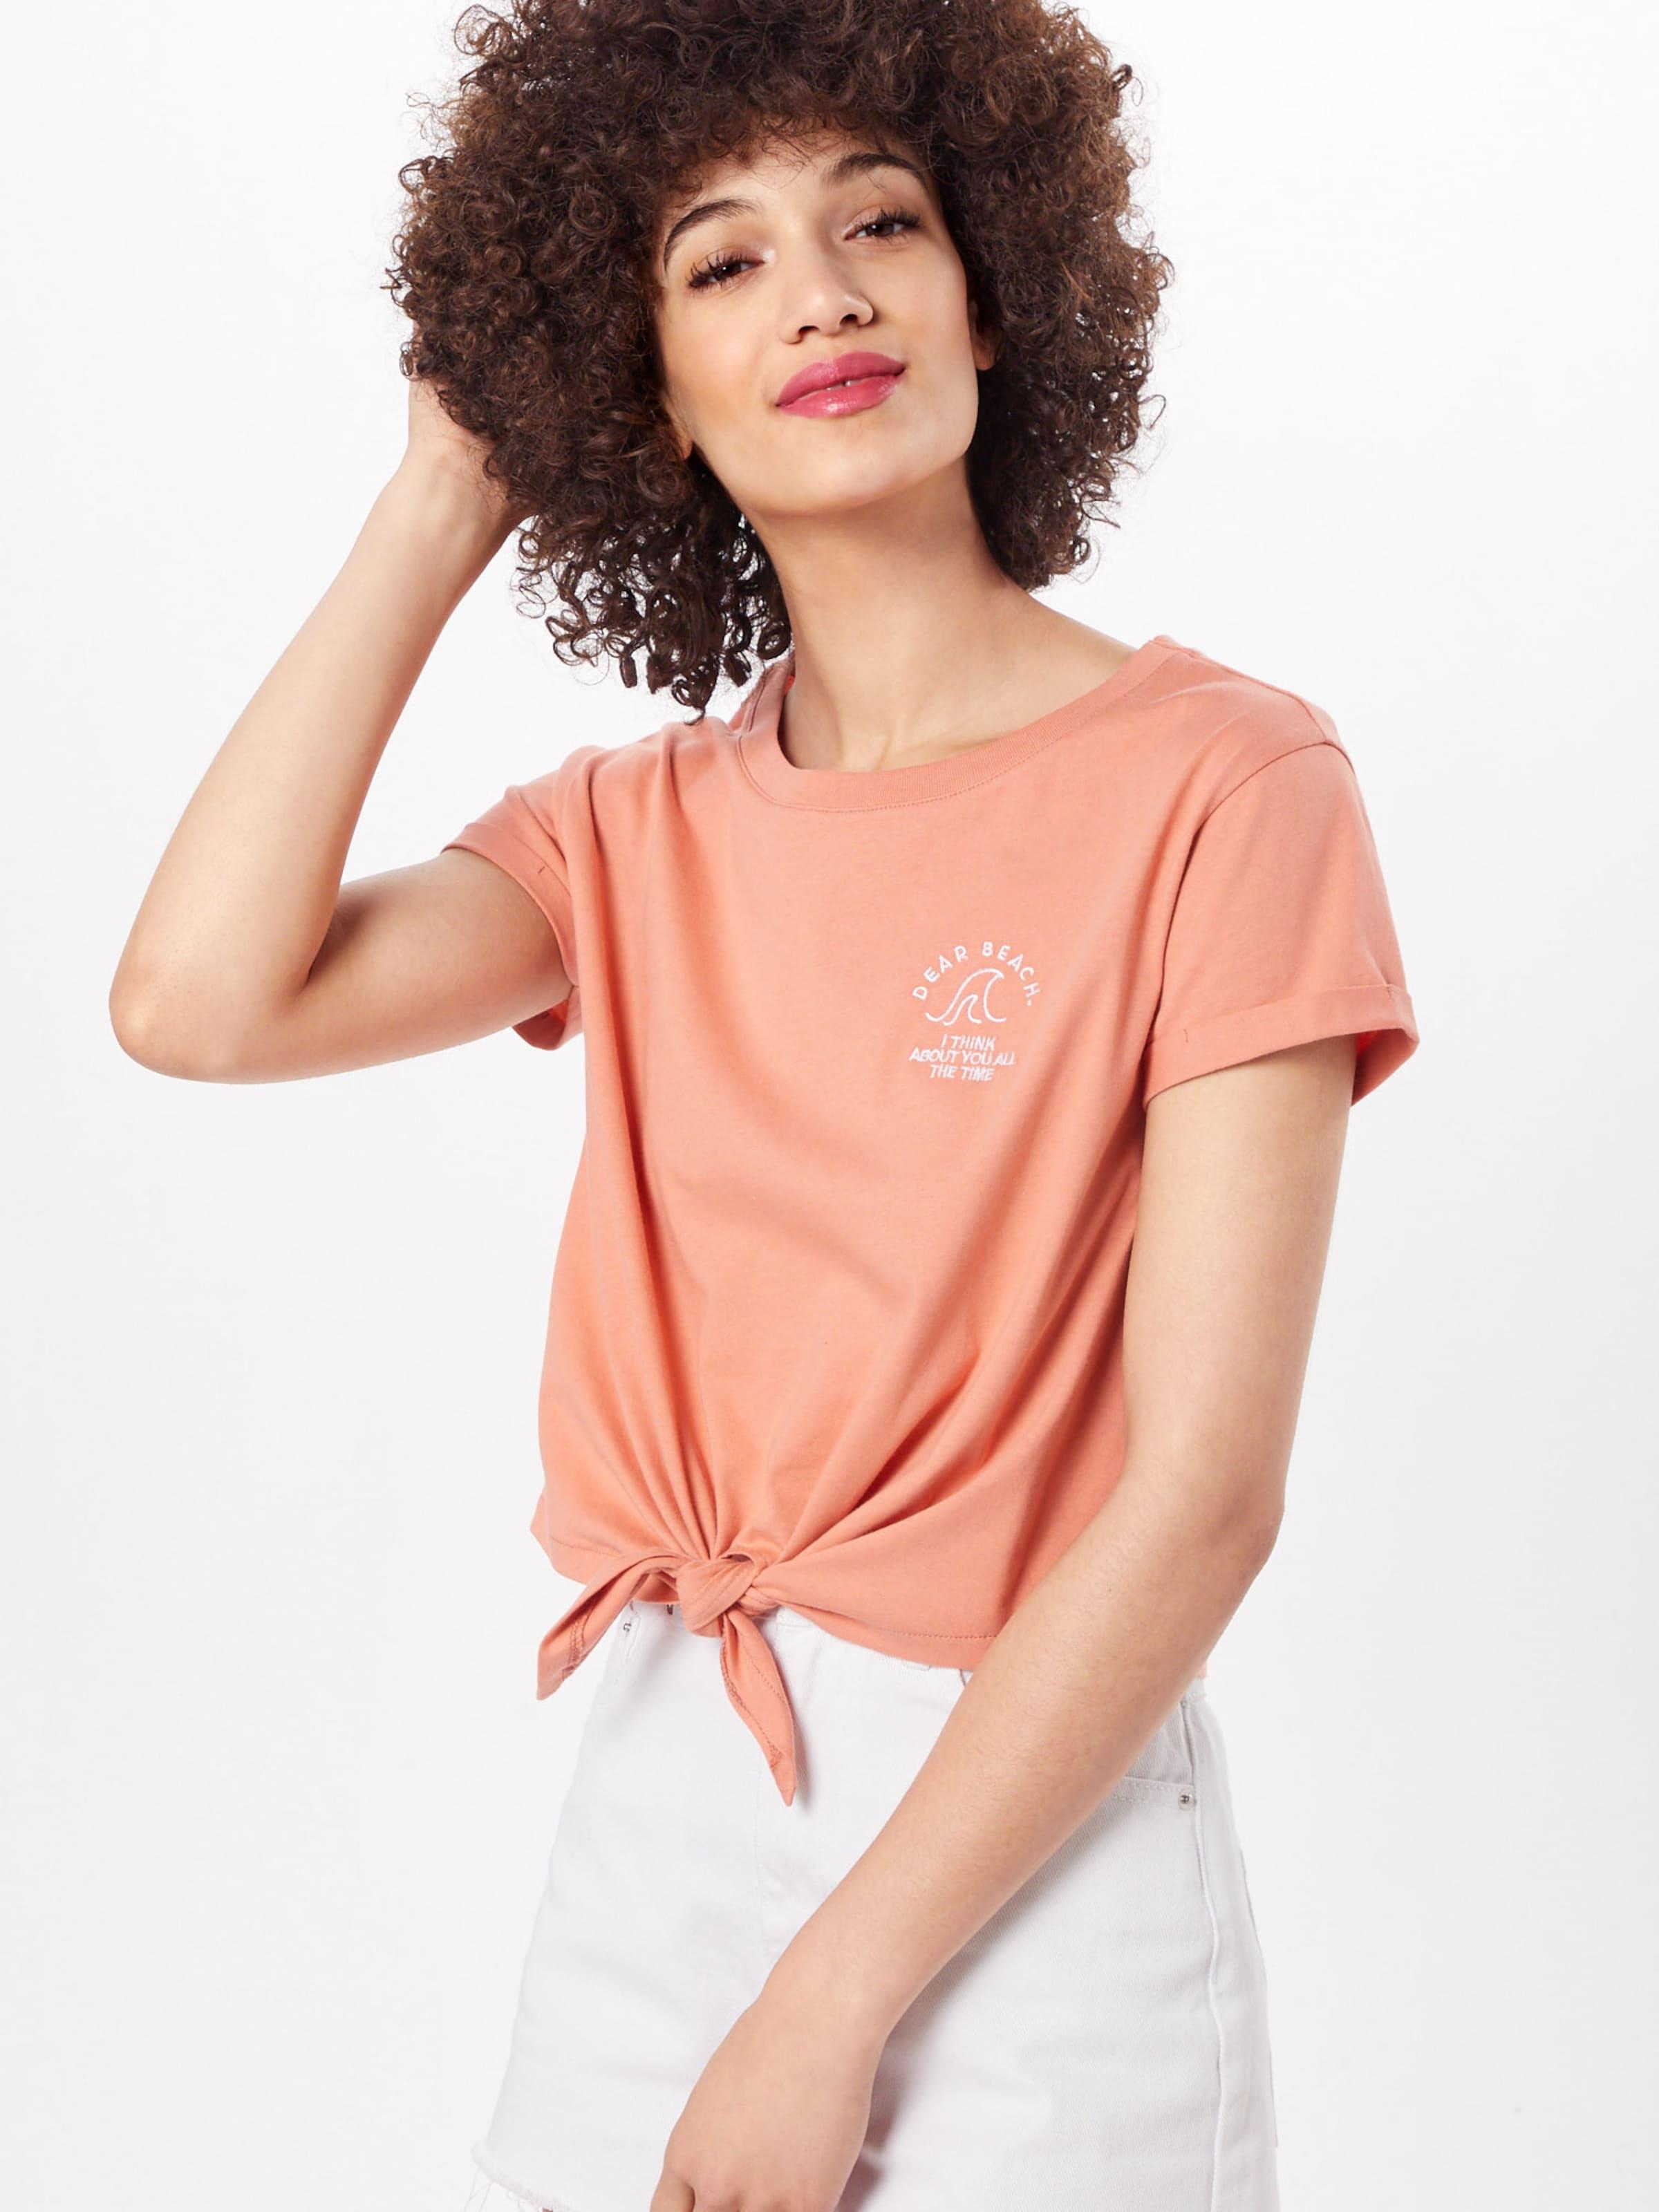 Orange T Review En shirt T Orange shirt Review En TJ5cuK13lF